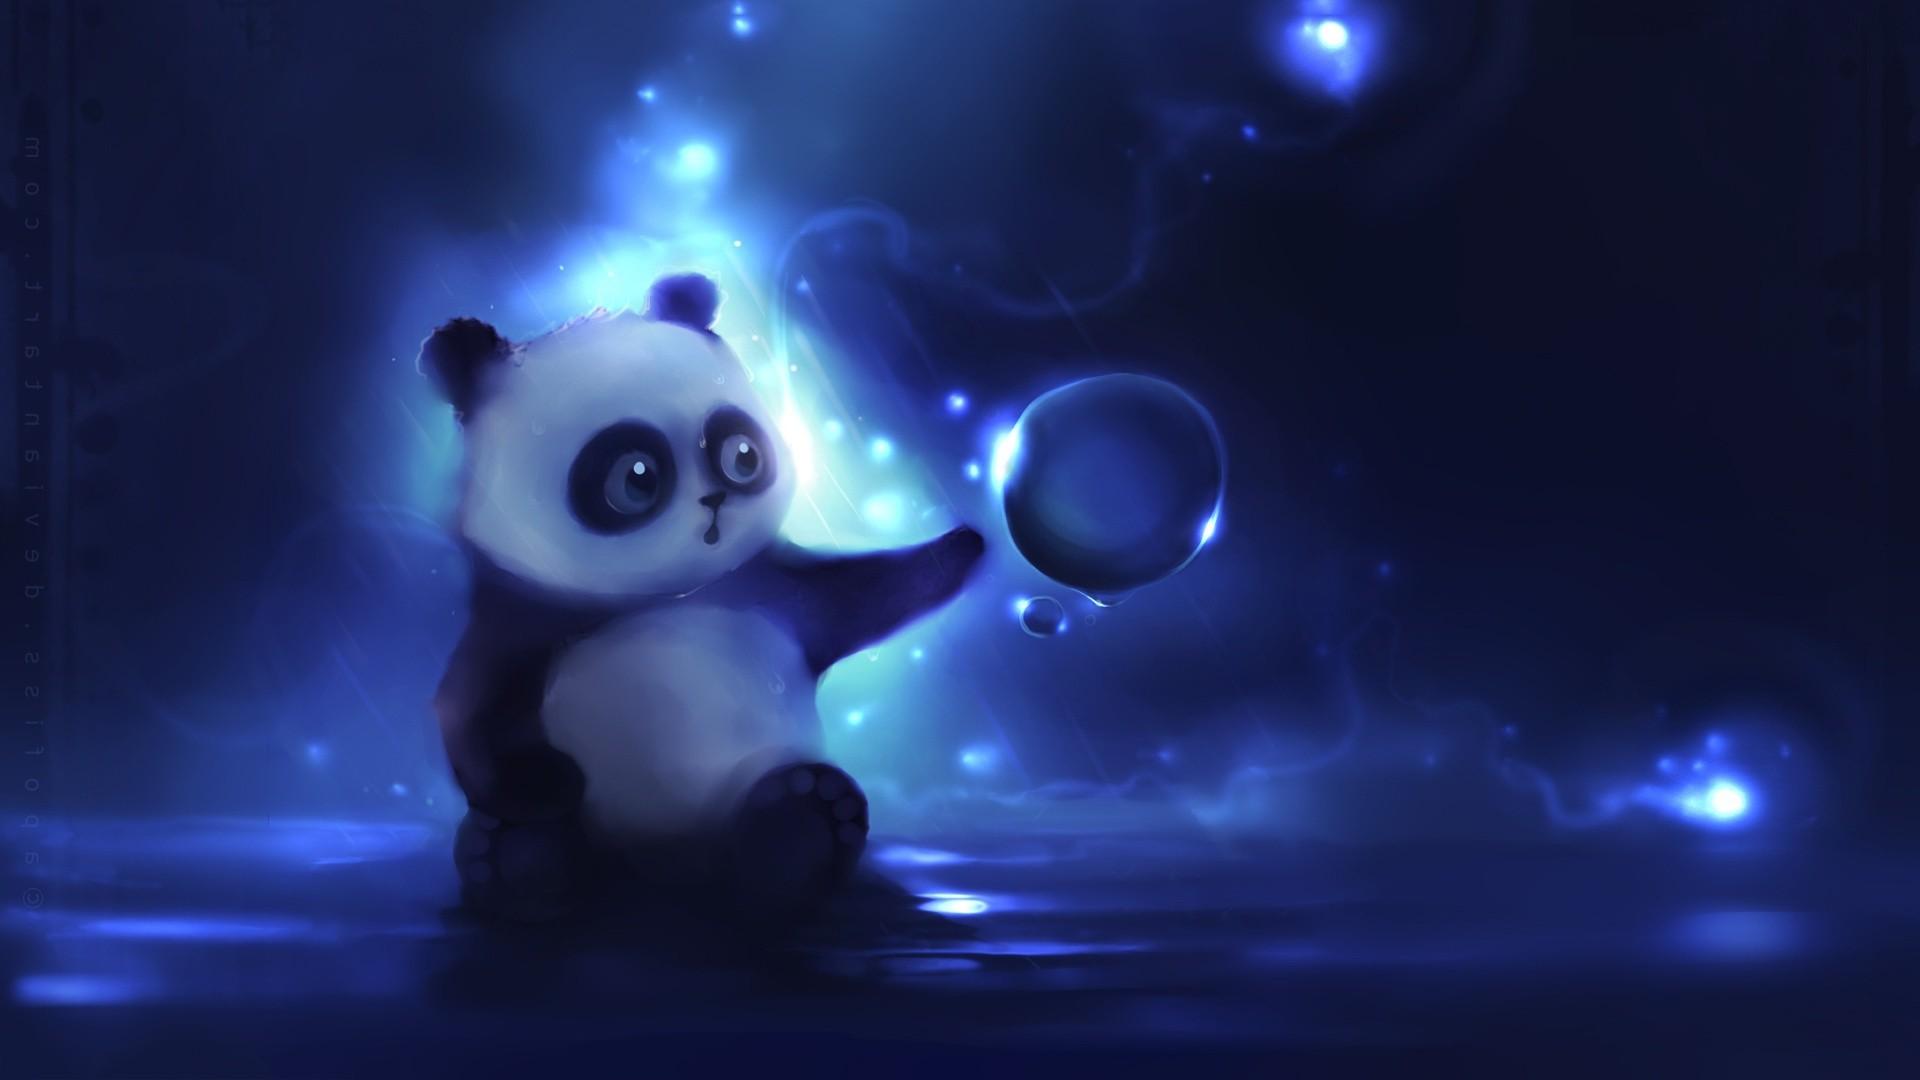 Panda Anime Series images